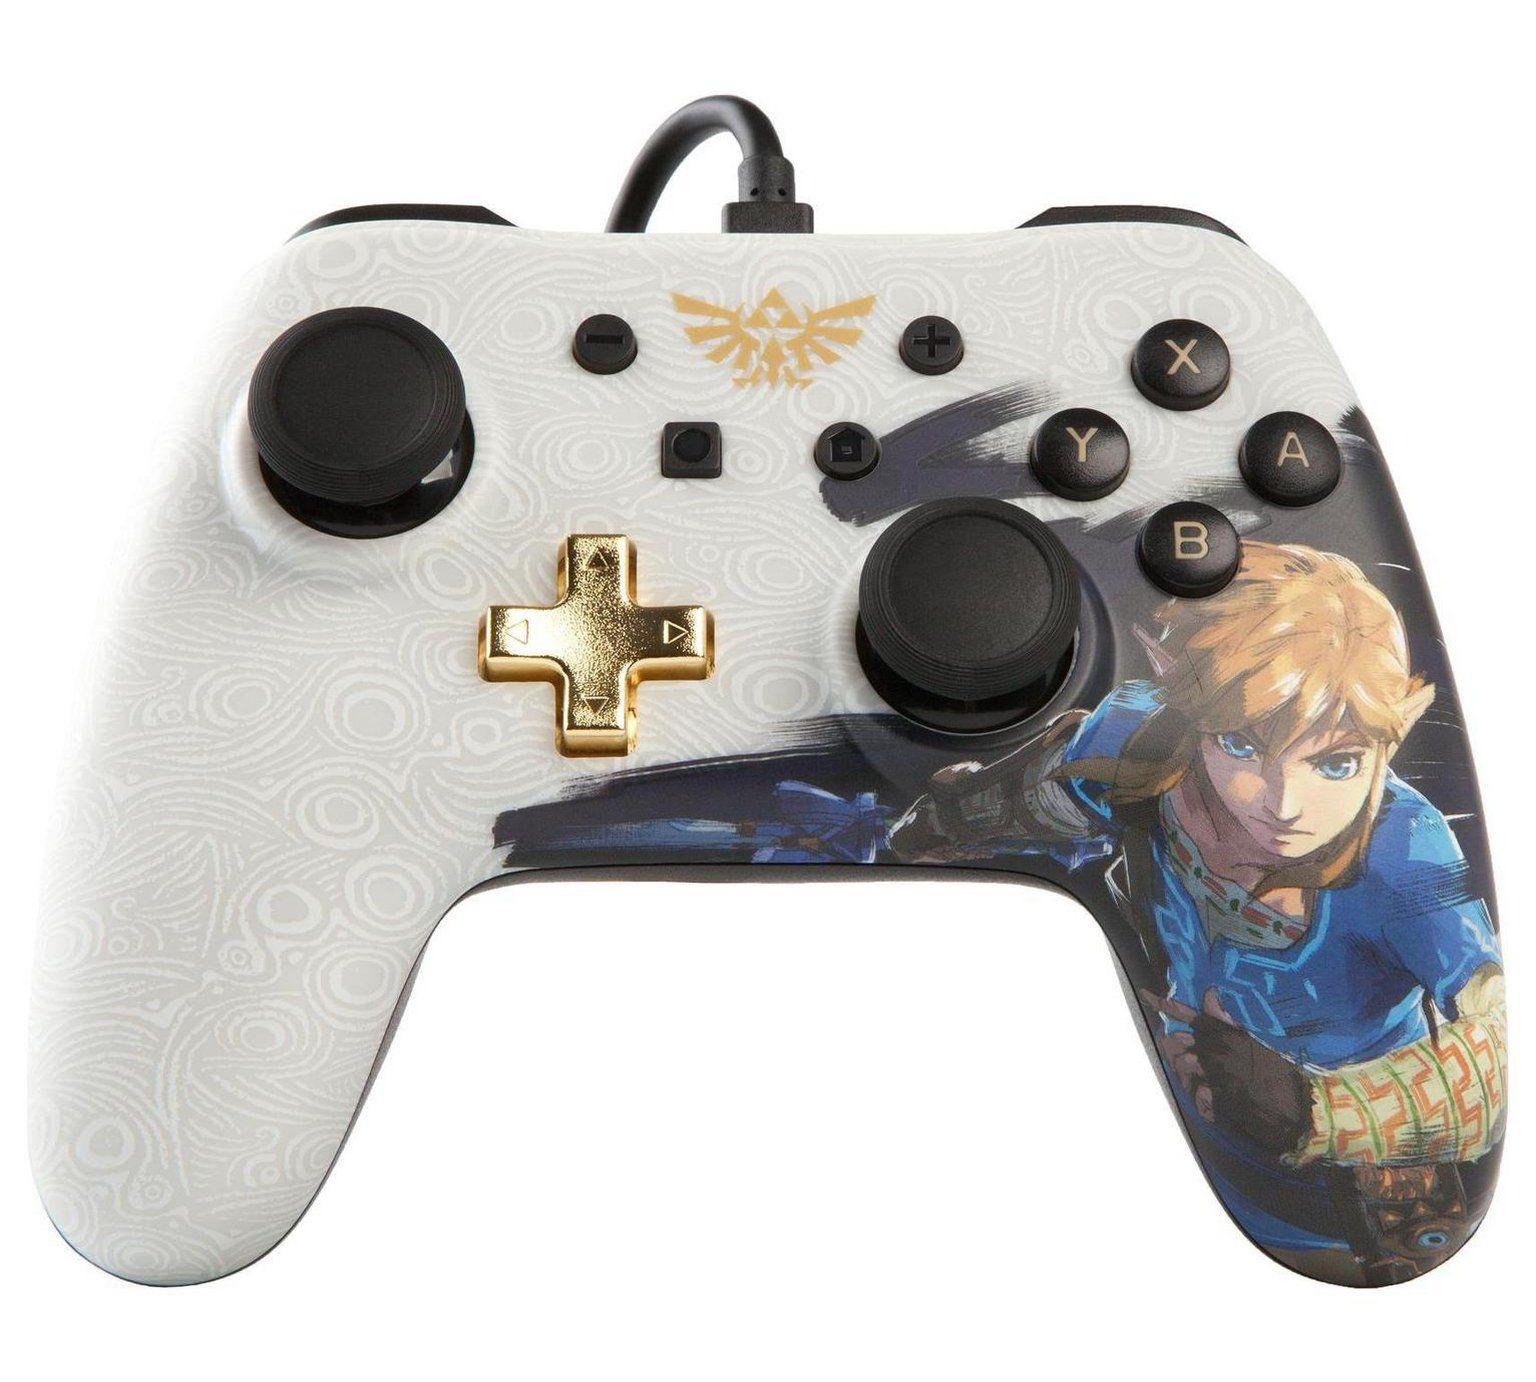 Nintendo Switch Zelda Reduced price wired controller £17.99 C+C @ Argos